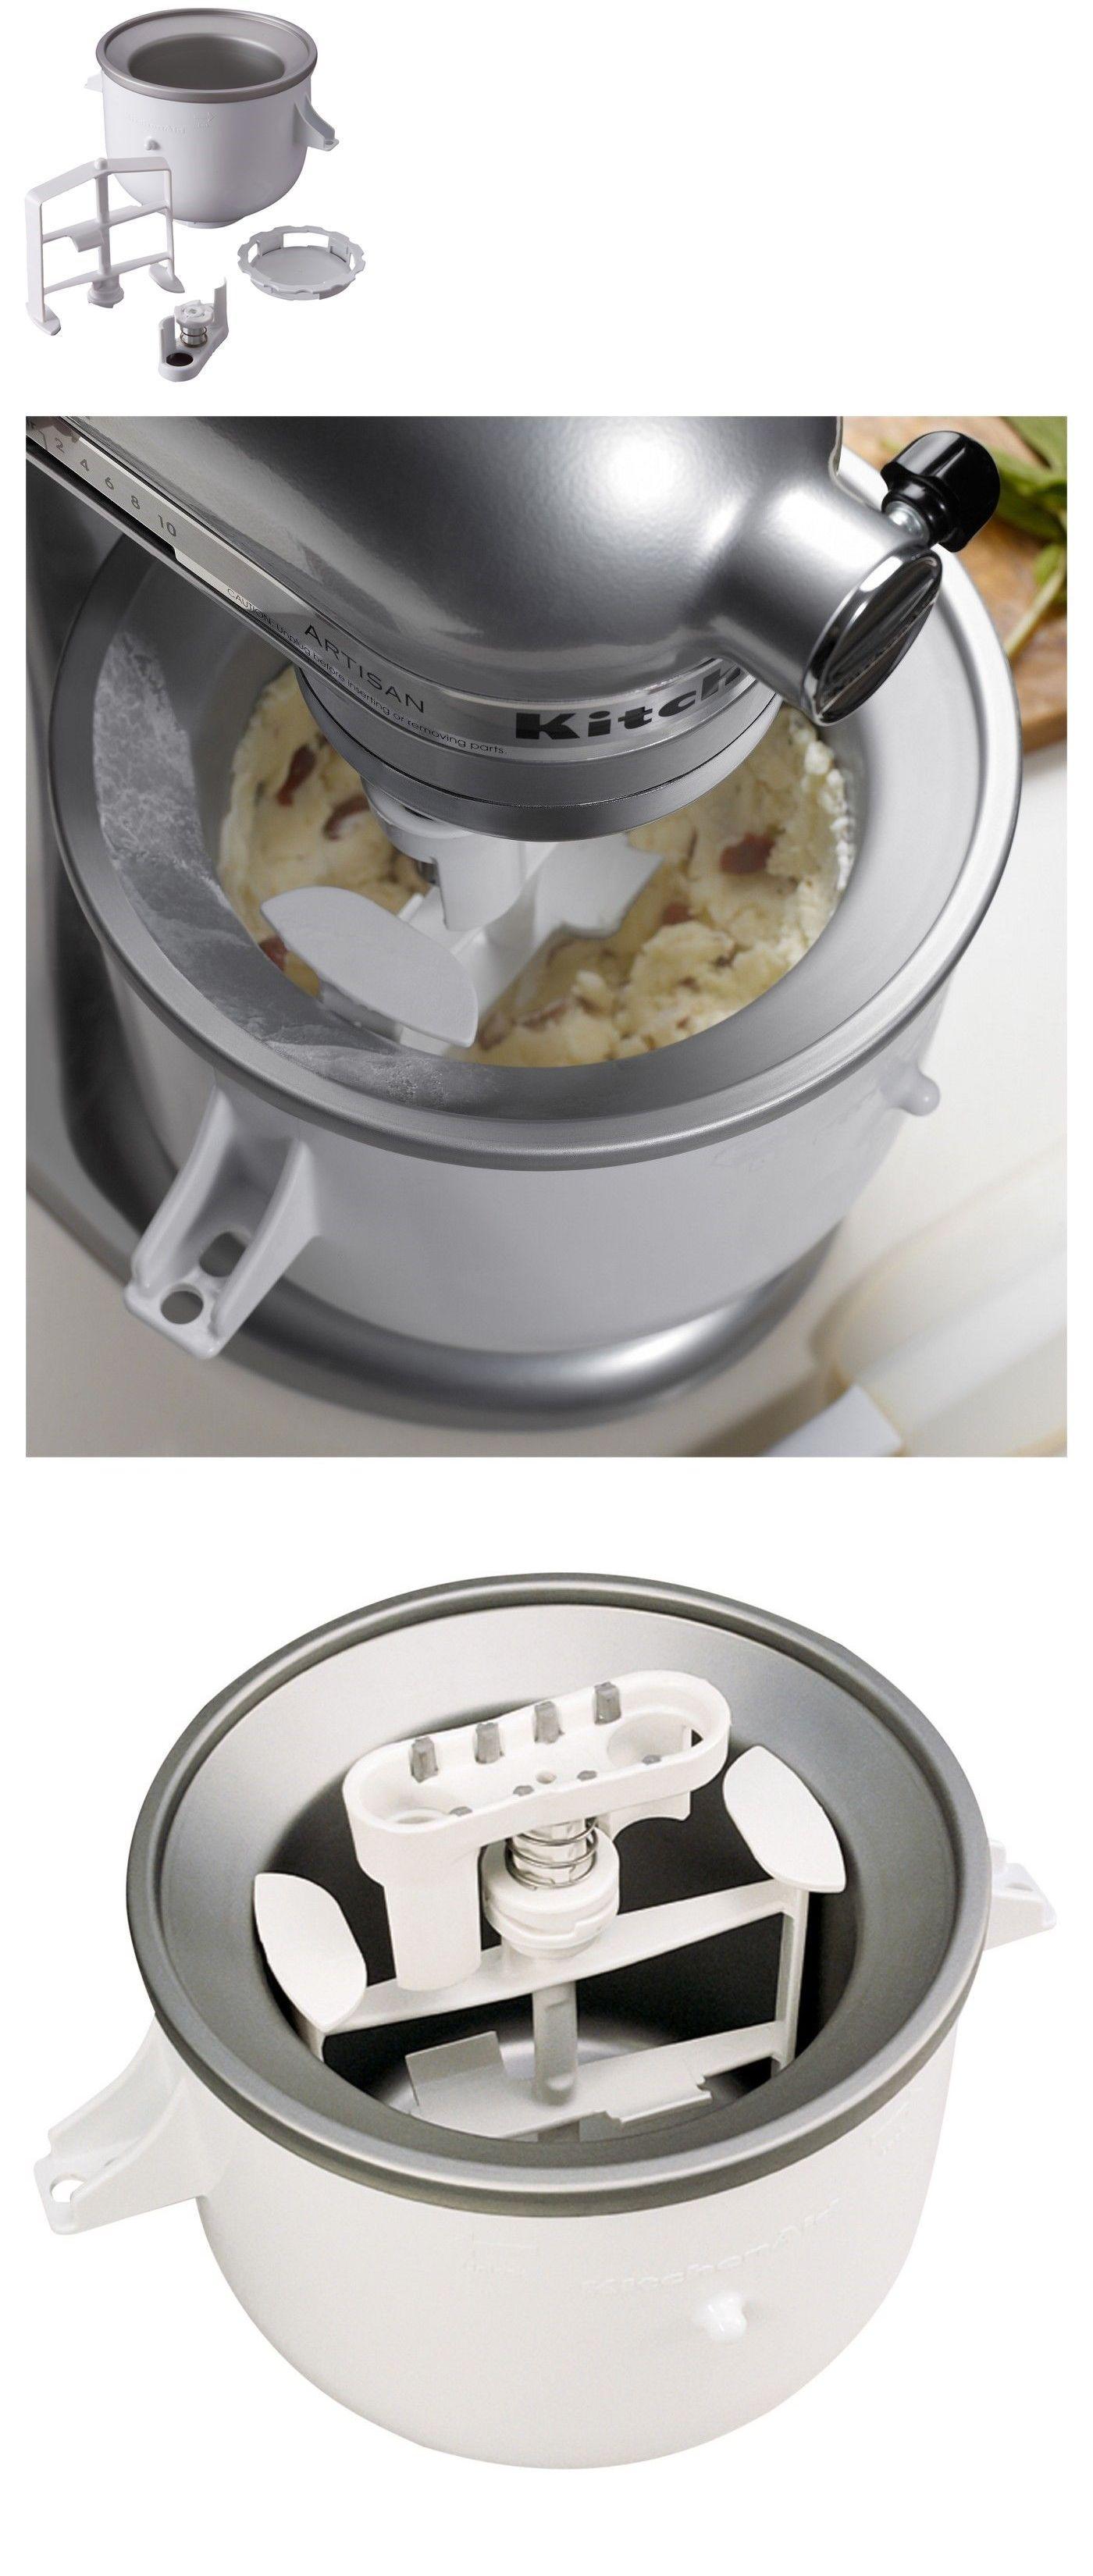 Ice Cream Makers 20676 Kitchenaid Kica 0wh Stand Mixer Ice Cream